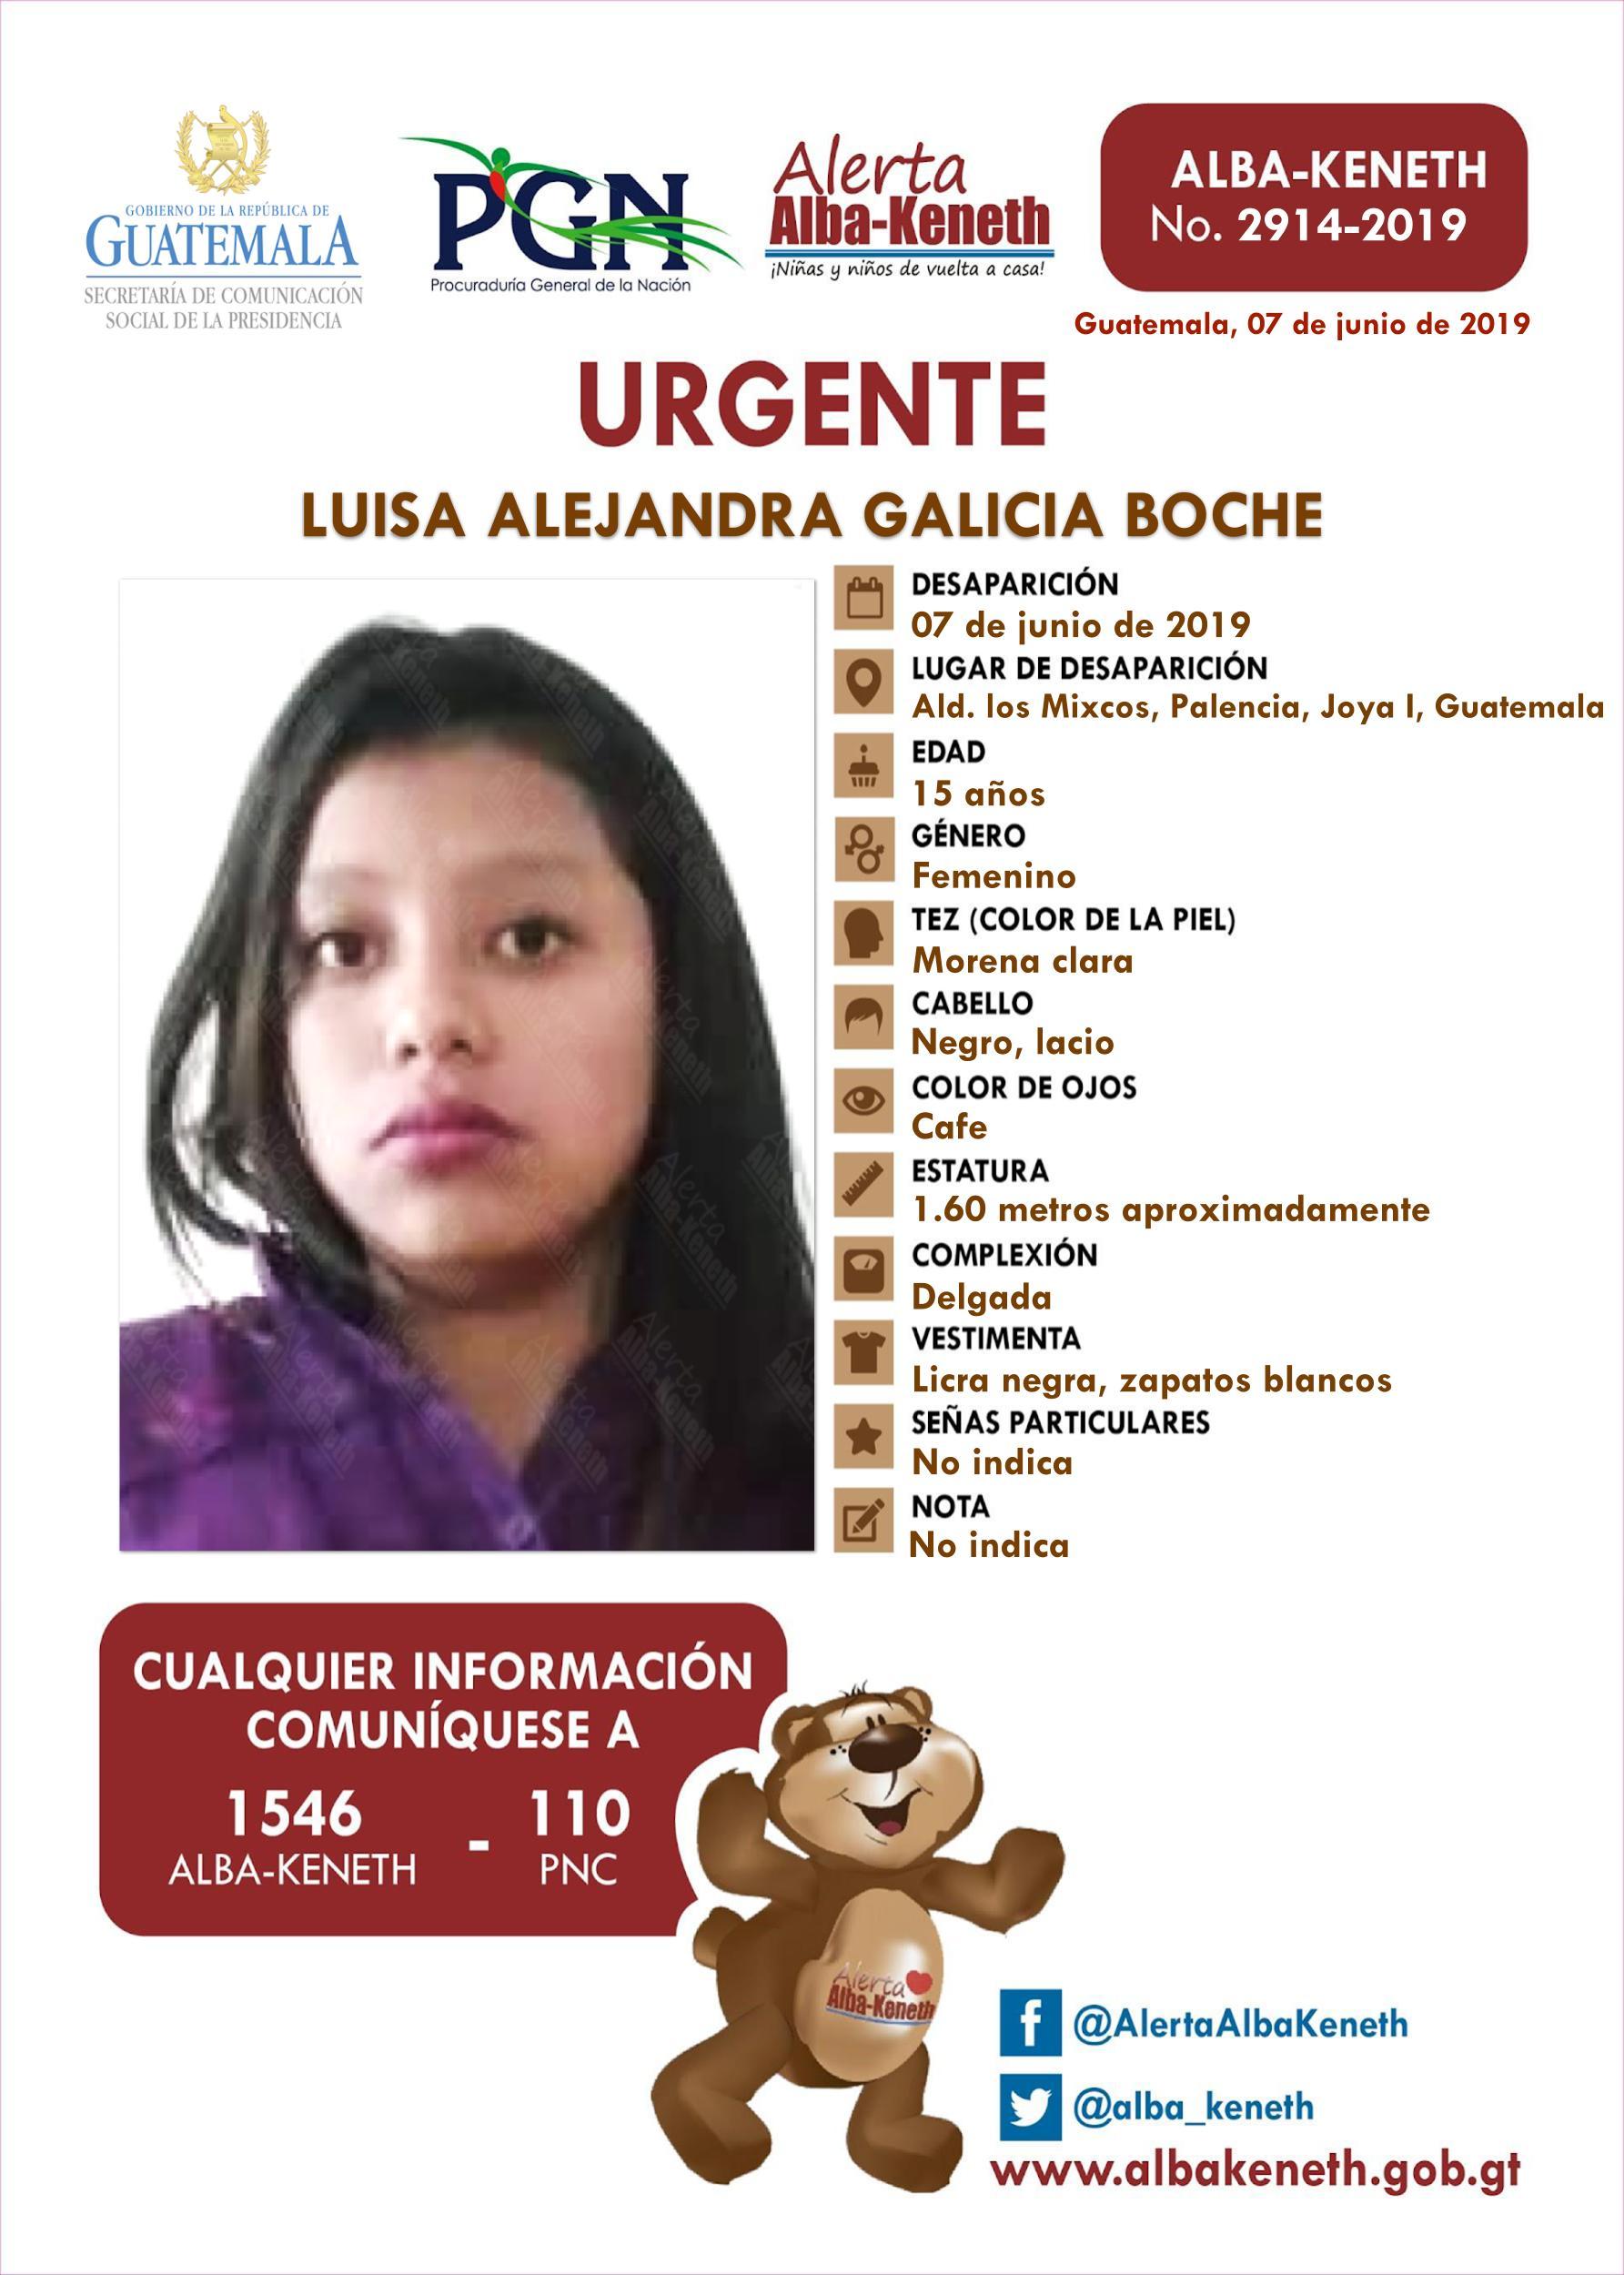 Luisa Alejandra Galicia Boche